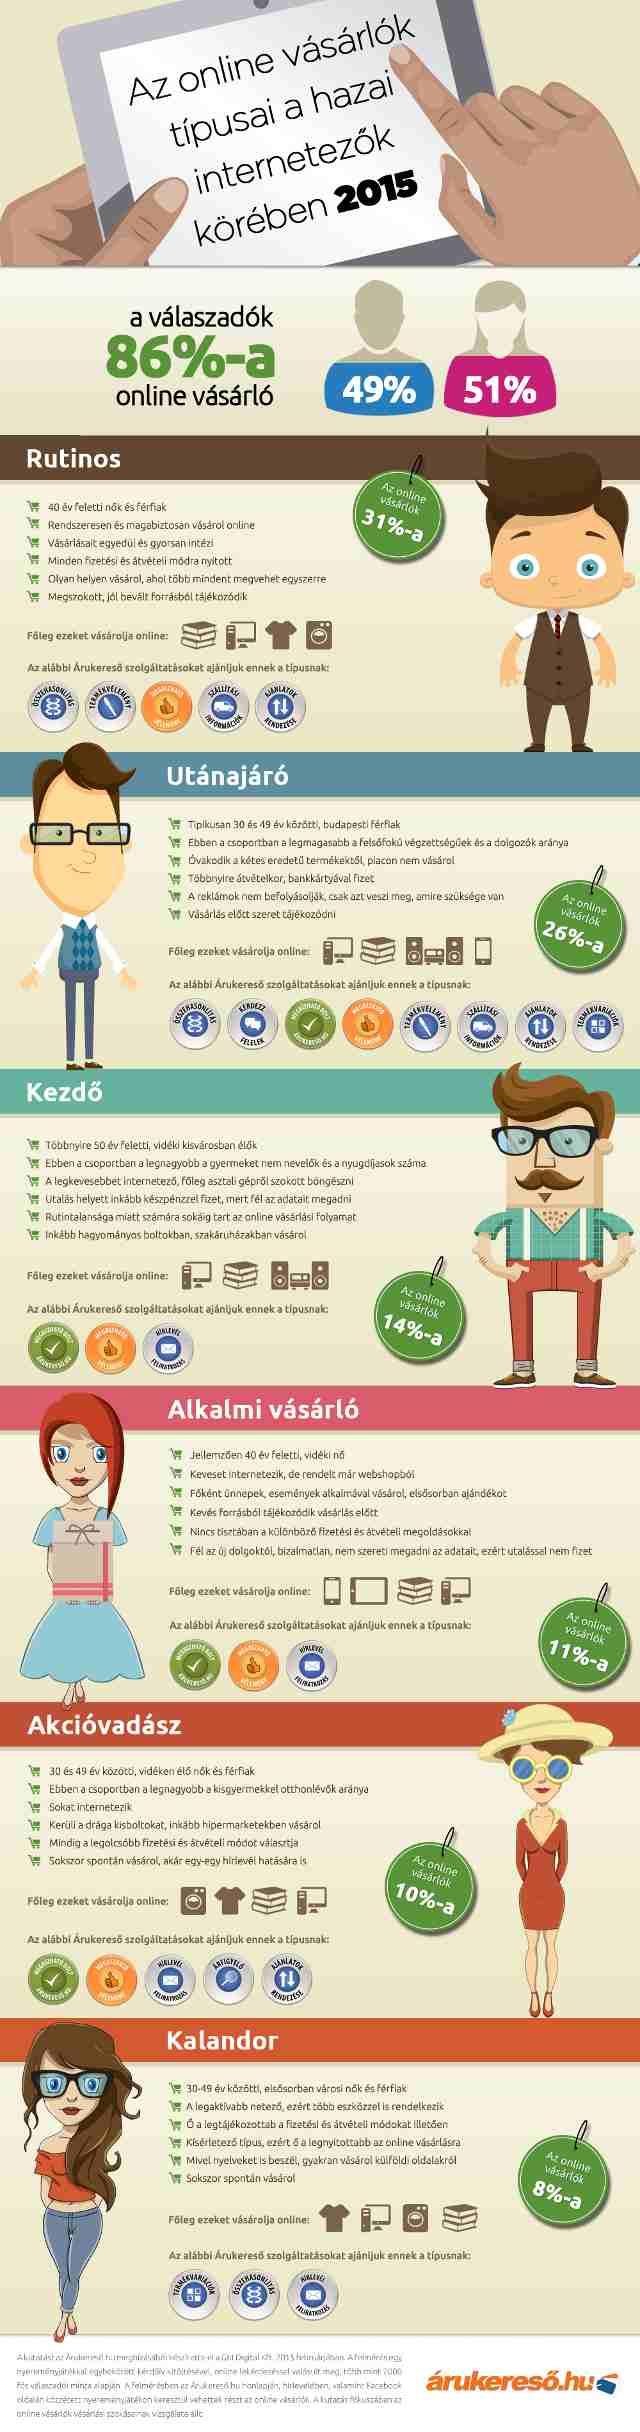 online-vasarlo-infografikon